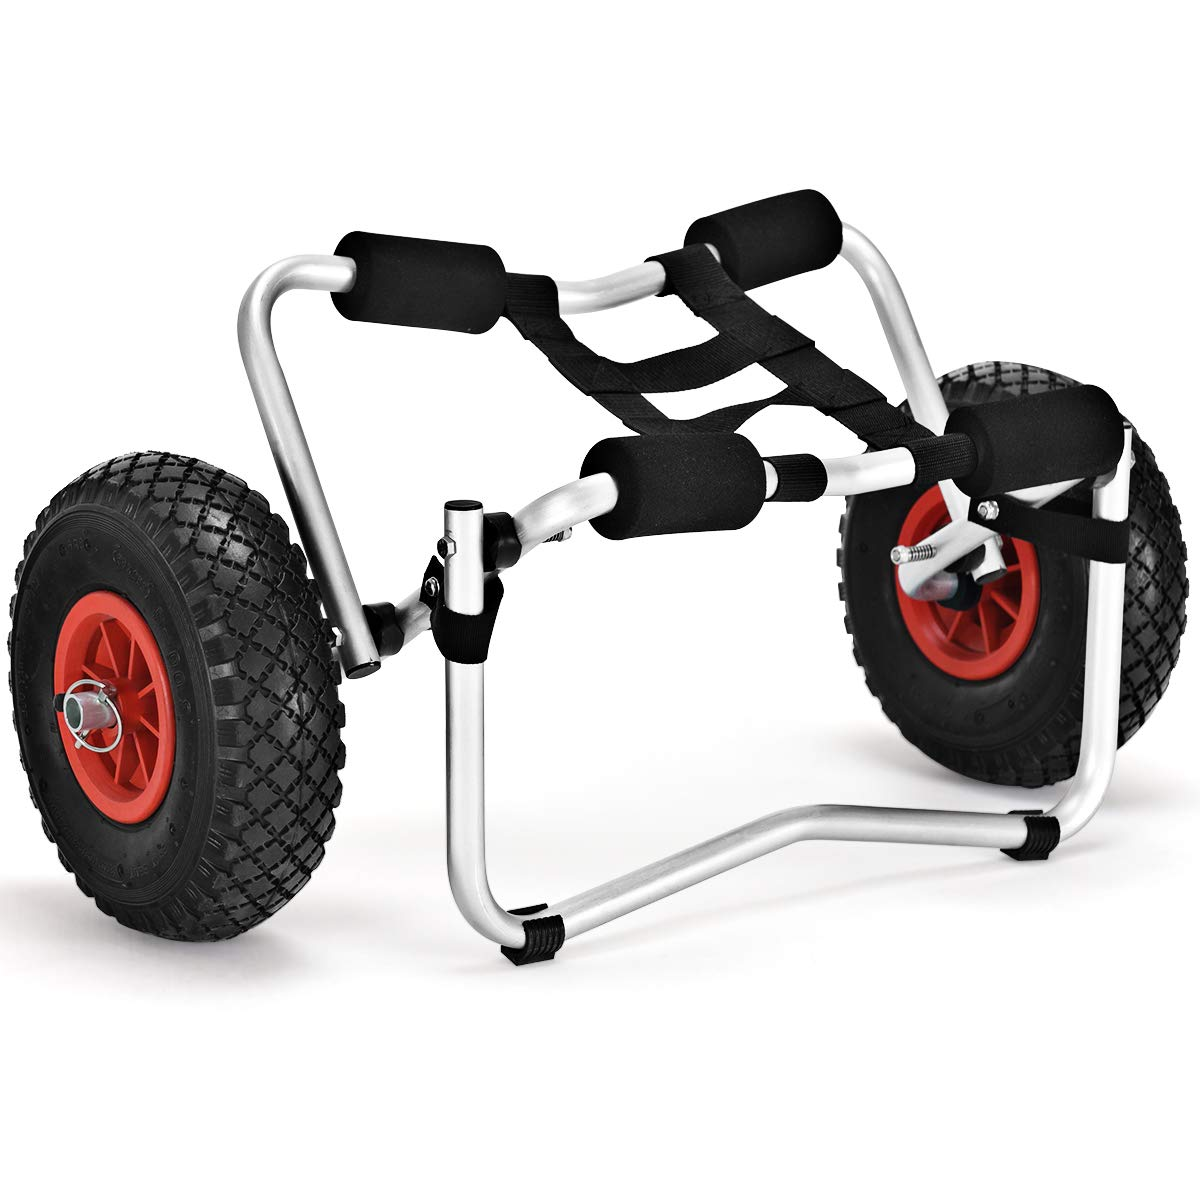 Giantex Kayak Cart New Aluminum Kayak Jon Boat Canoe Gear Trolley W/Wheels, Large Load Capacity, Solid Frame Dolly Cart by Giantex